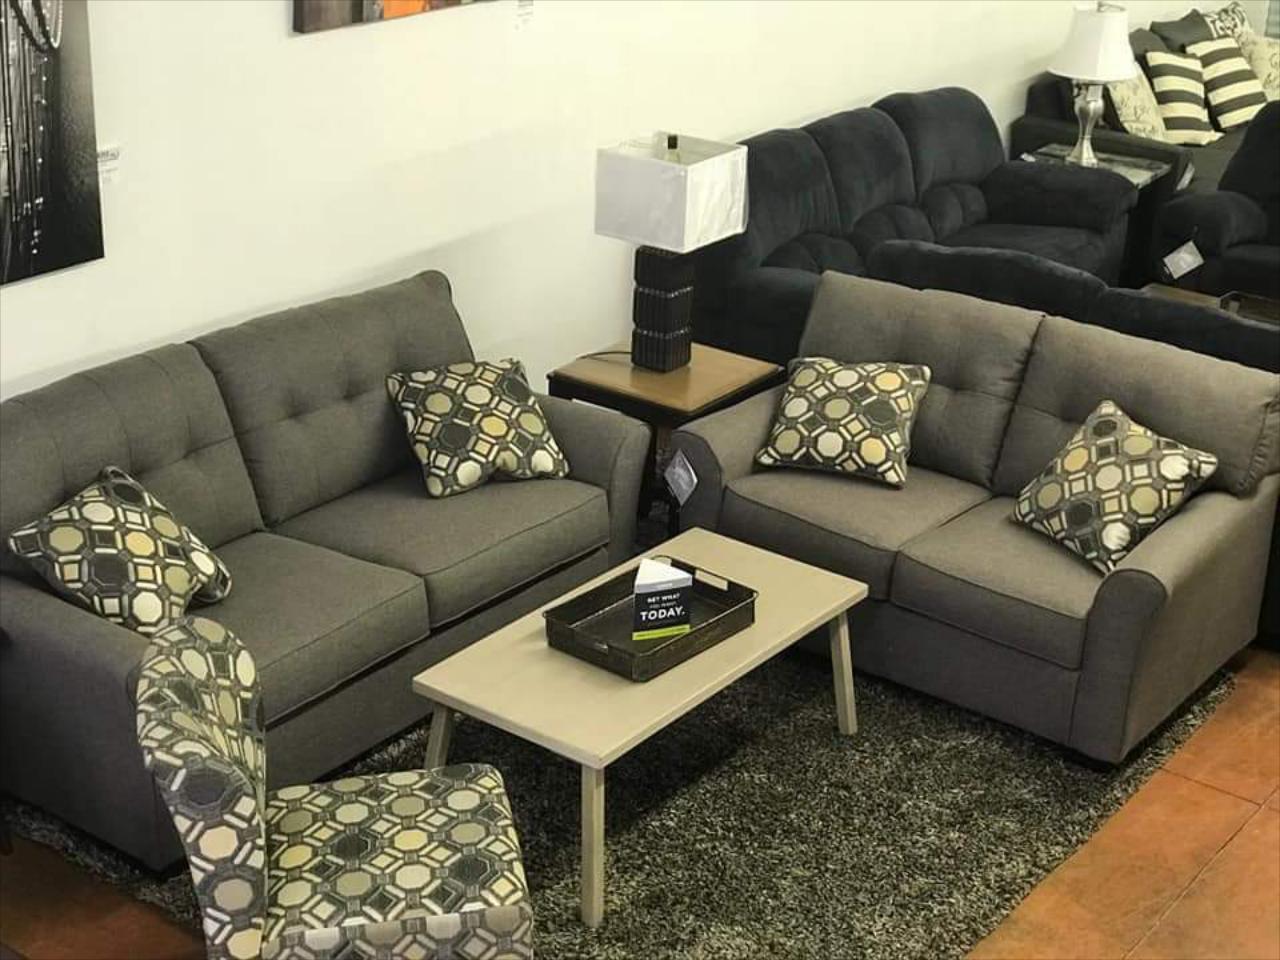 Tremendous Tibbee Sofa Loveseat Accent Chair Set Bralicious Painted Fabric Chair Ideas Braliciousco